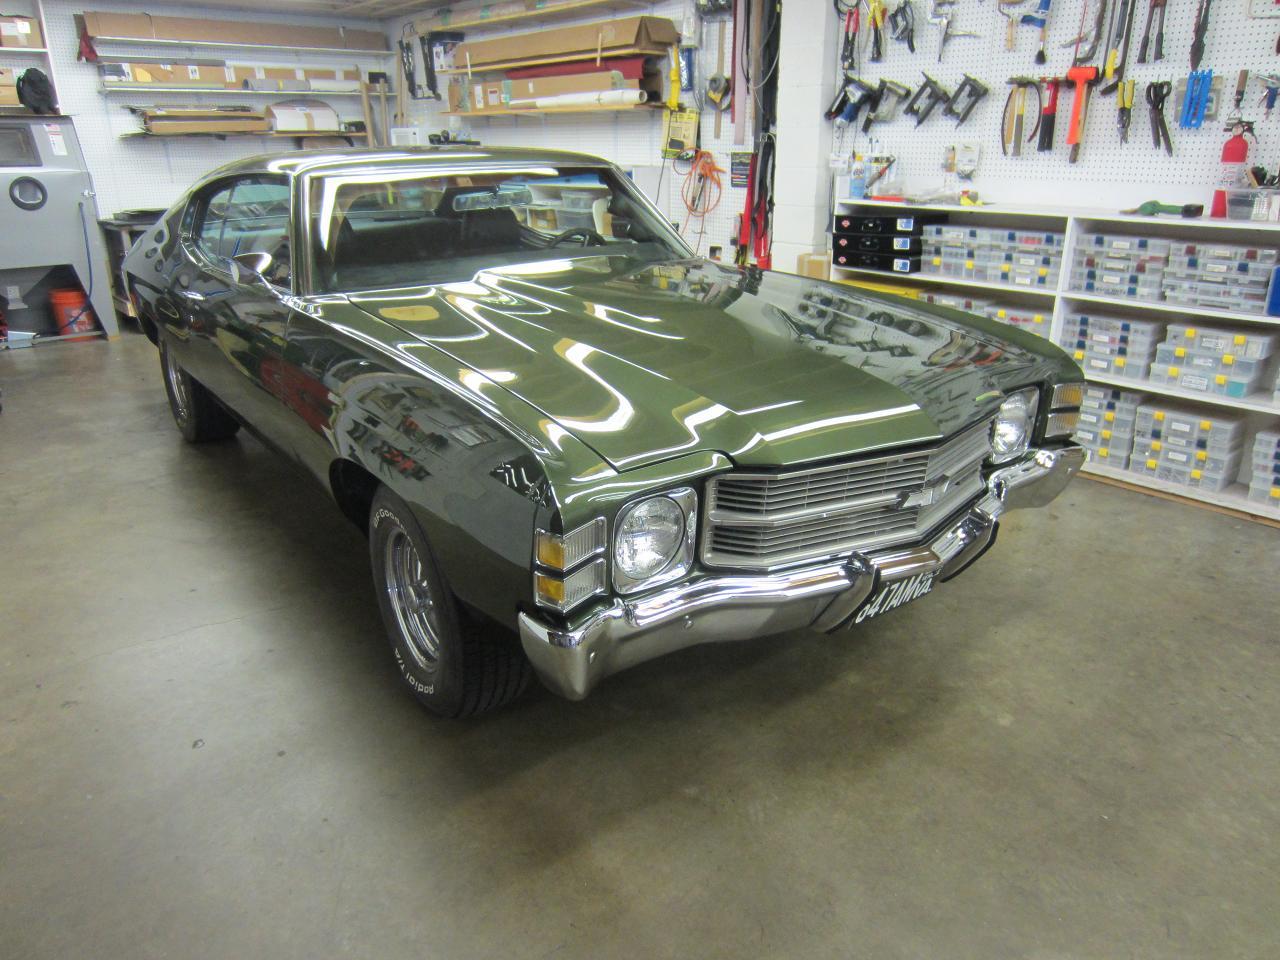 1971-Chevrolet-Chevelle-c1